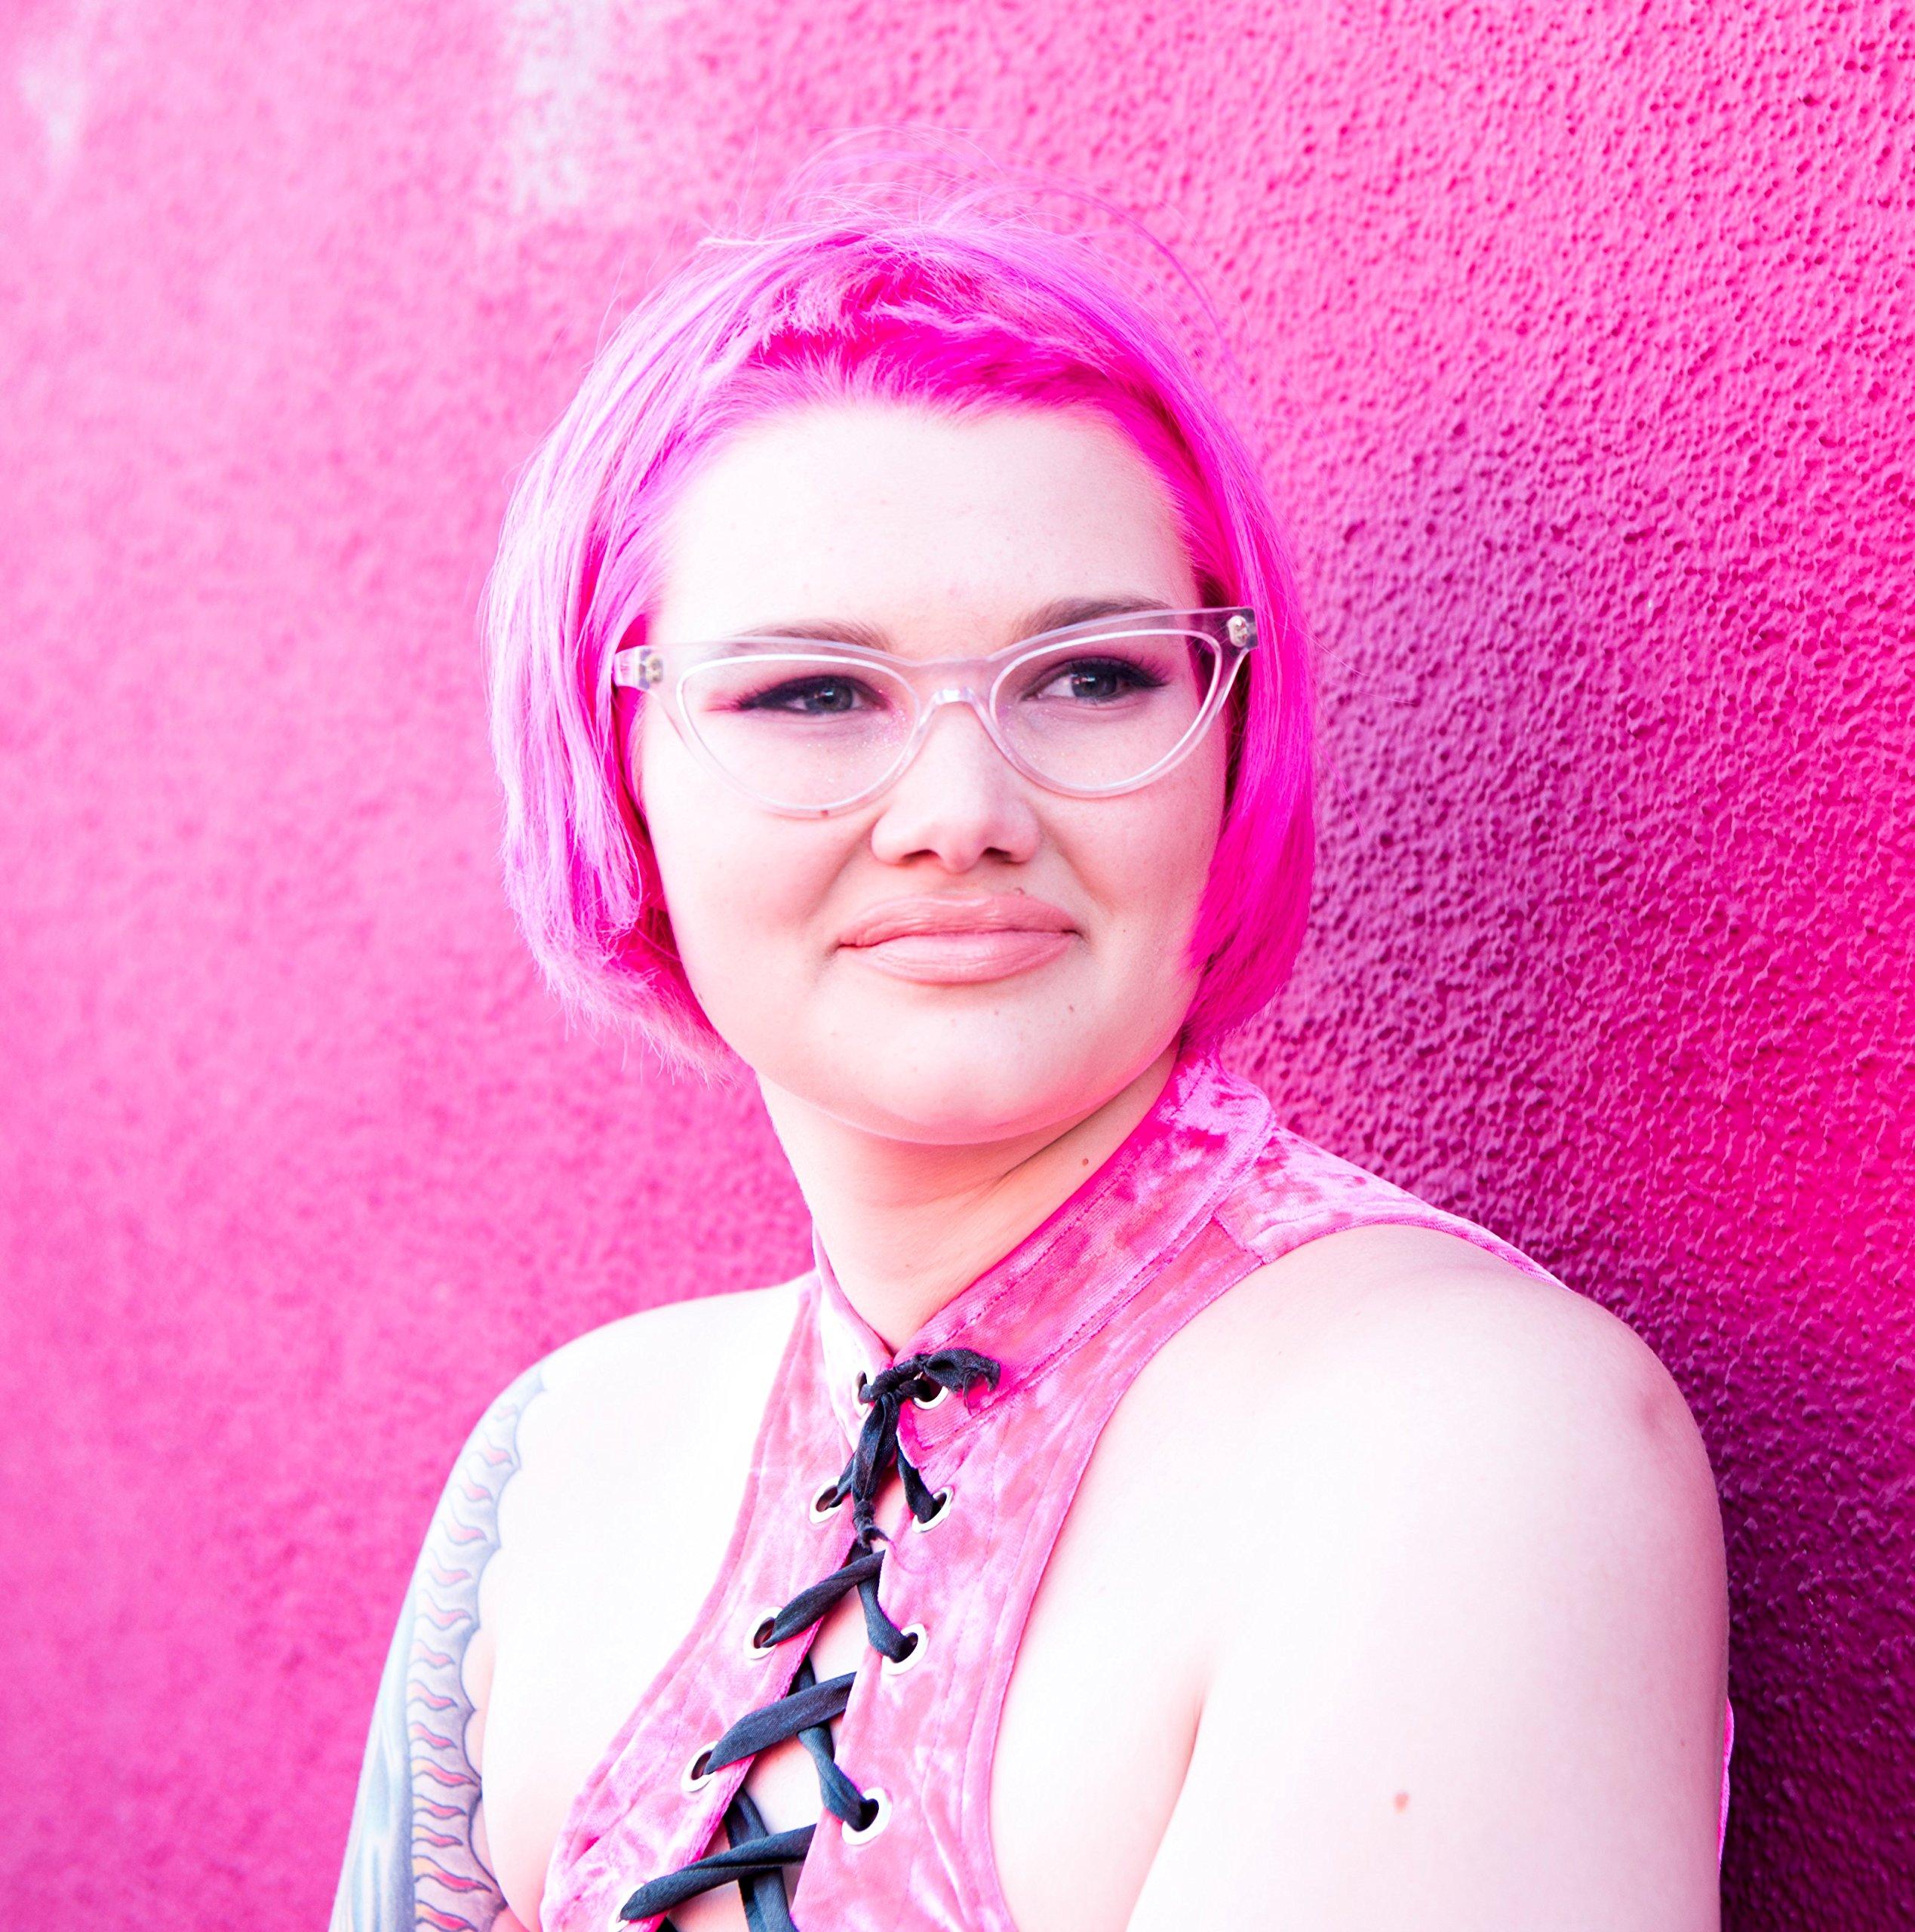 Good Dye Young Semi-Permanent Vegan & Cruelty-Free Cream Hair Dye Color [EX-GIRL PINK 4oz]